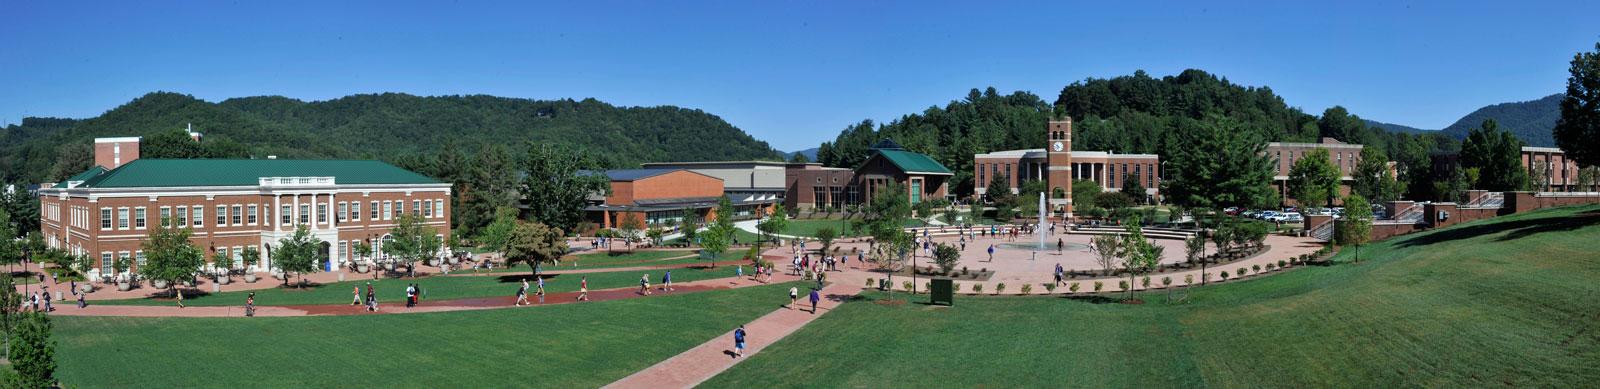 Western Carolina University - Visit WCU